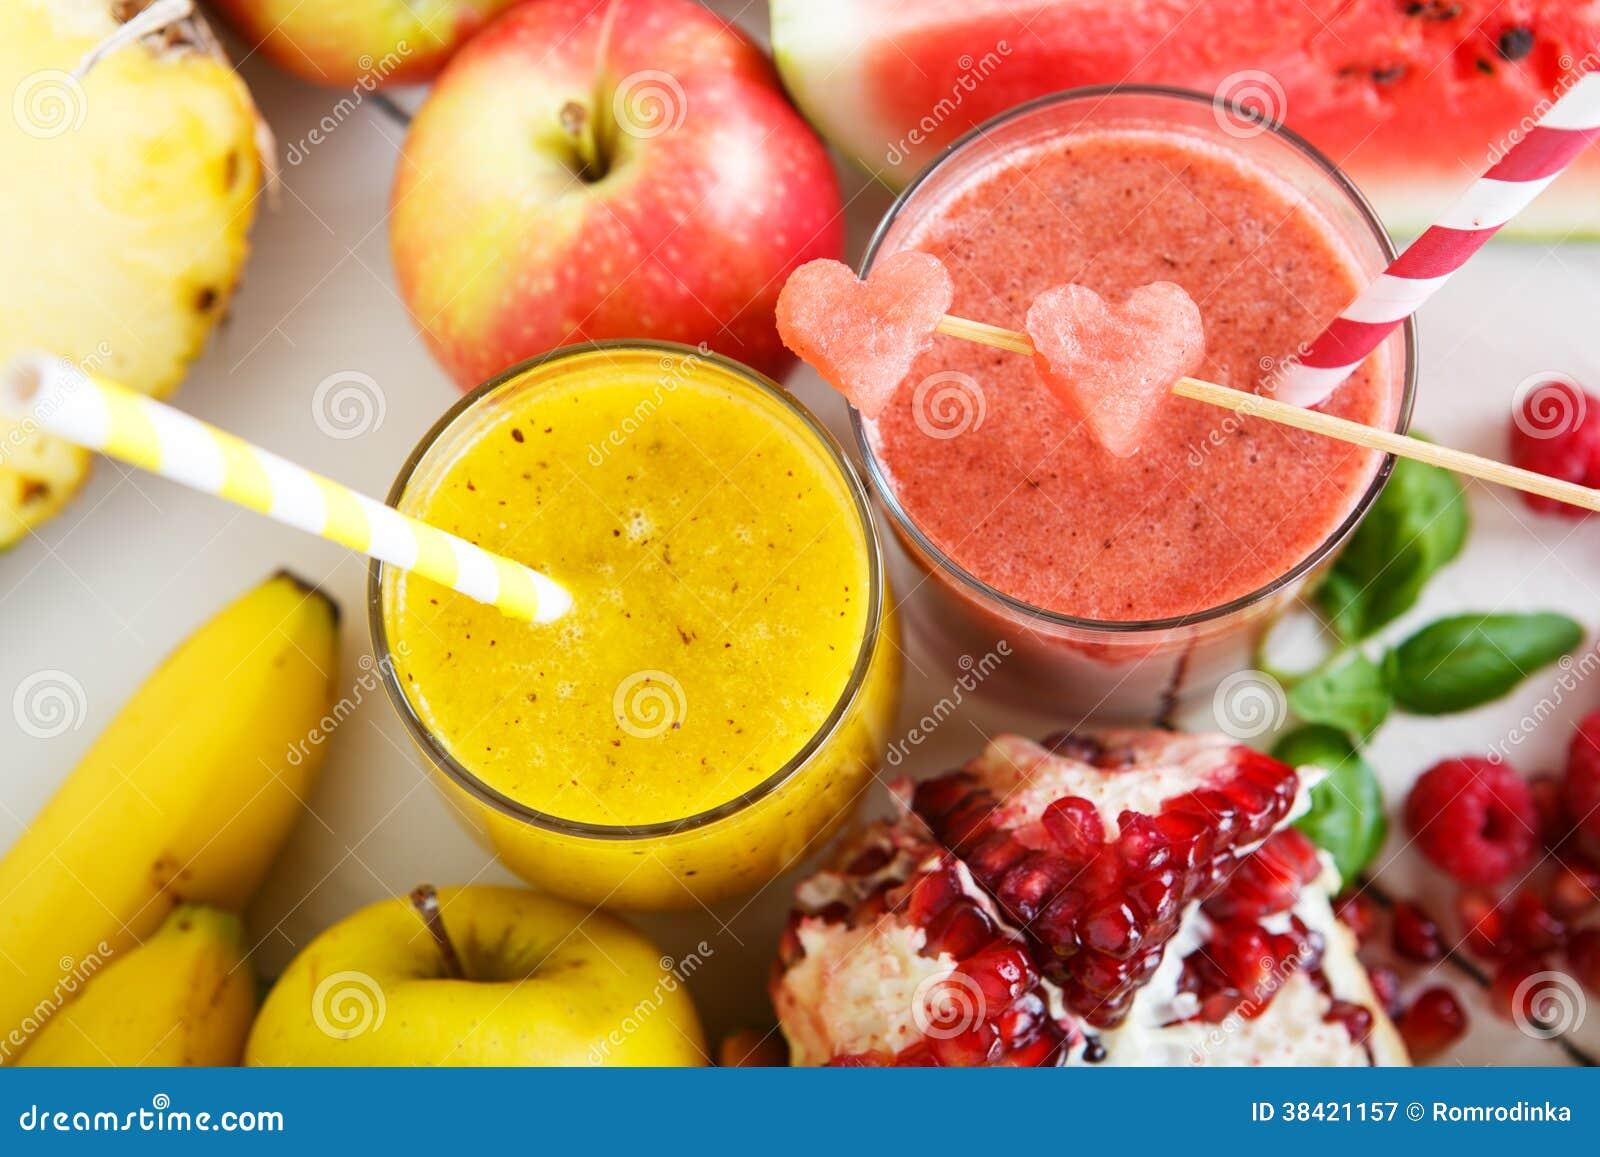 apple banana watermelon smoothie